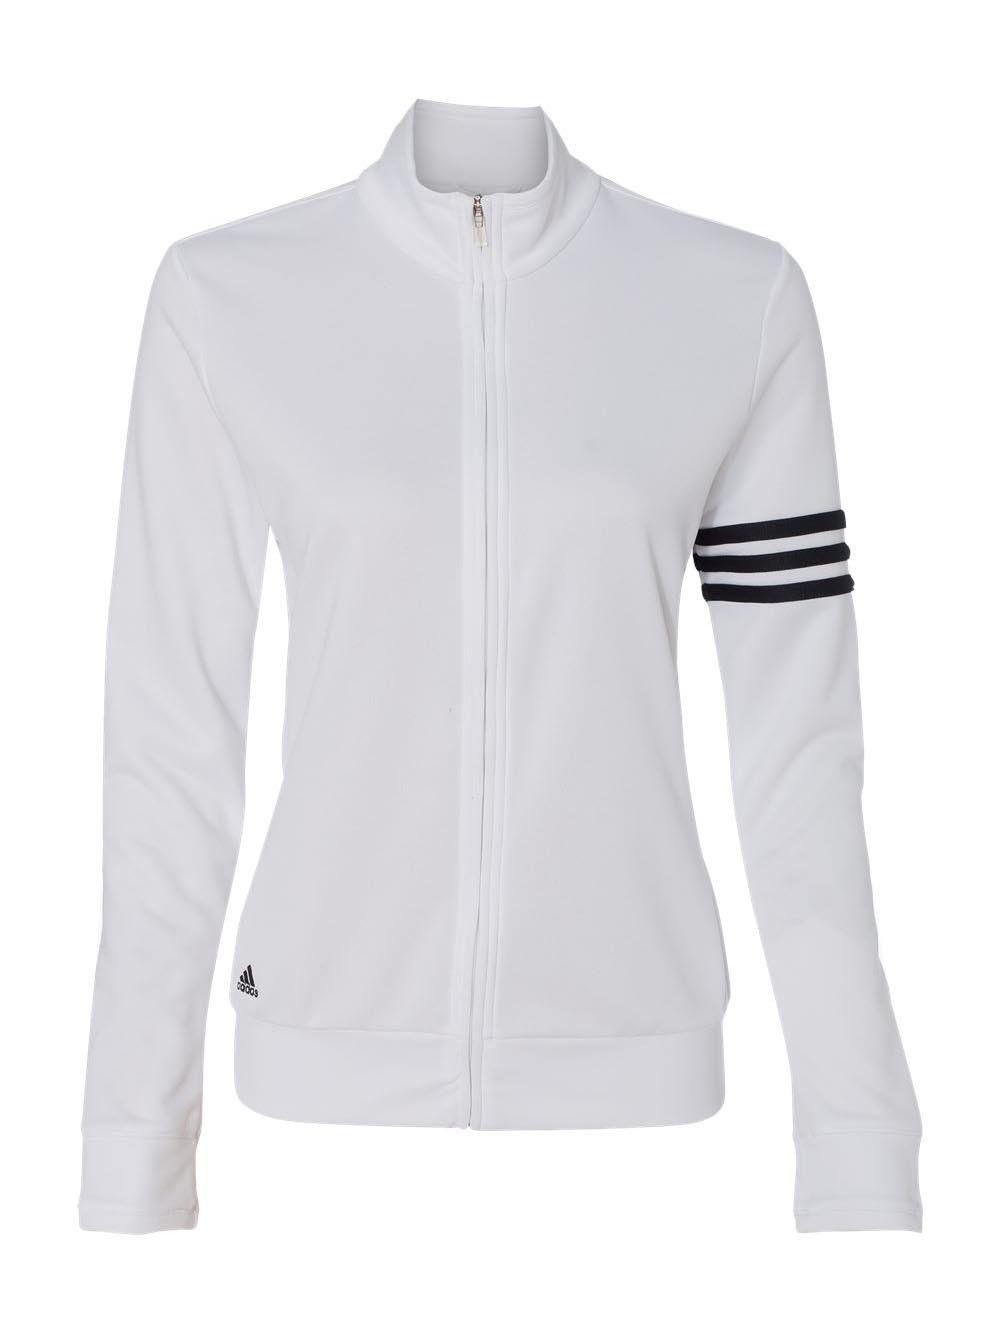 Women Golf Clothing Adidas A191 Ladies Climalite 3stripes Full Zip Pullover Jacket White Black Large French Terry Jacket Pullover Jacket Adidas Women